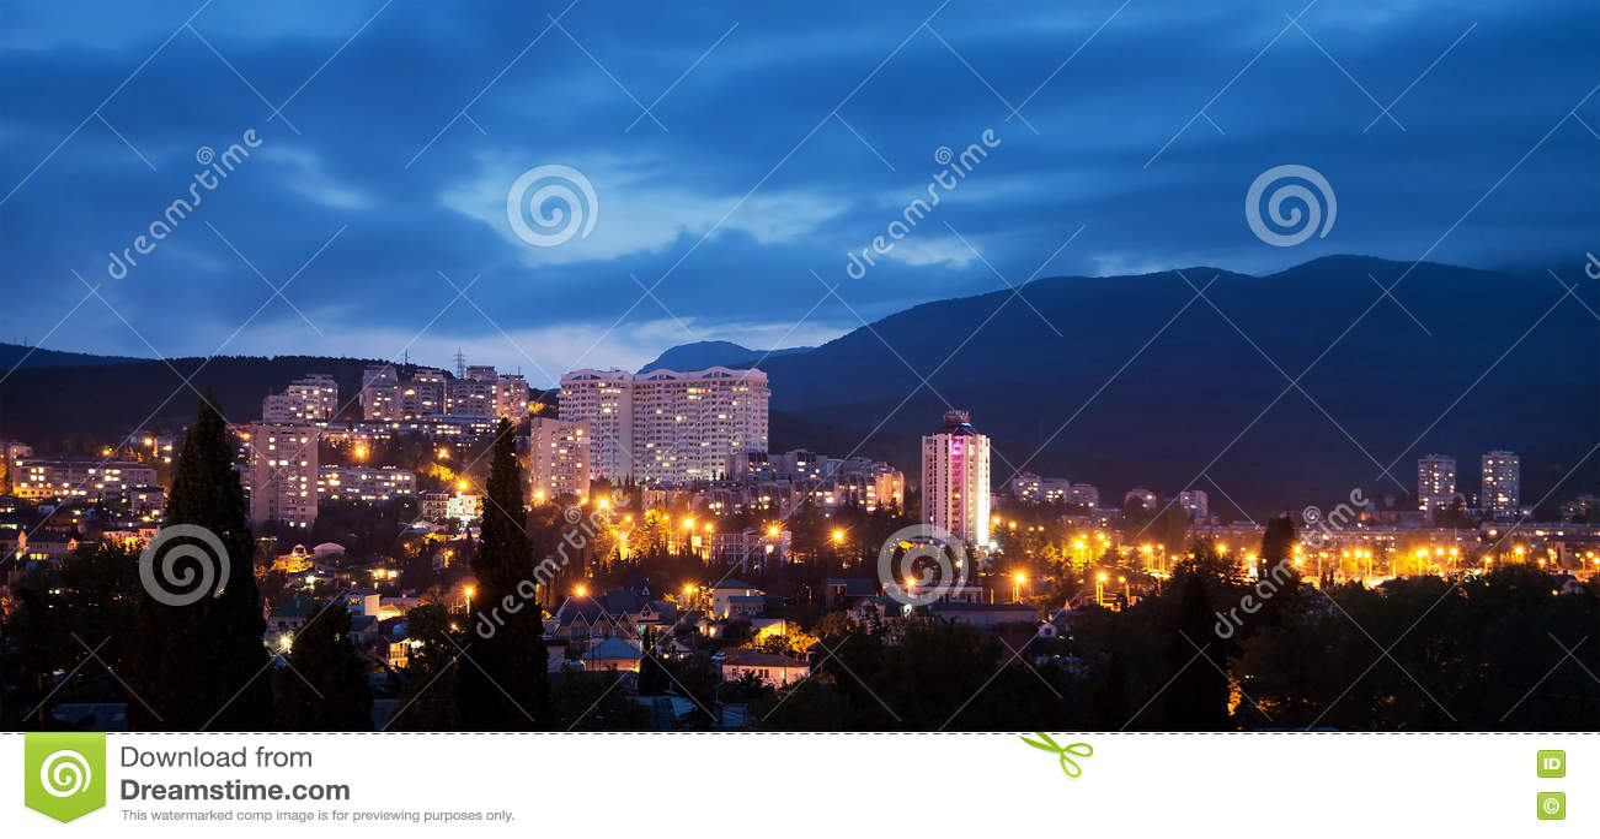 Alushta på natten, skymning cityscape crimea